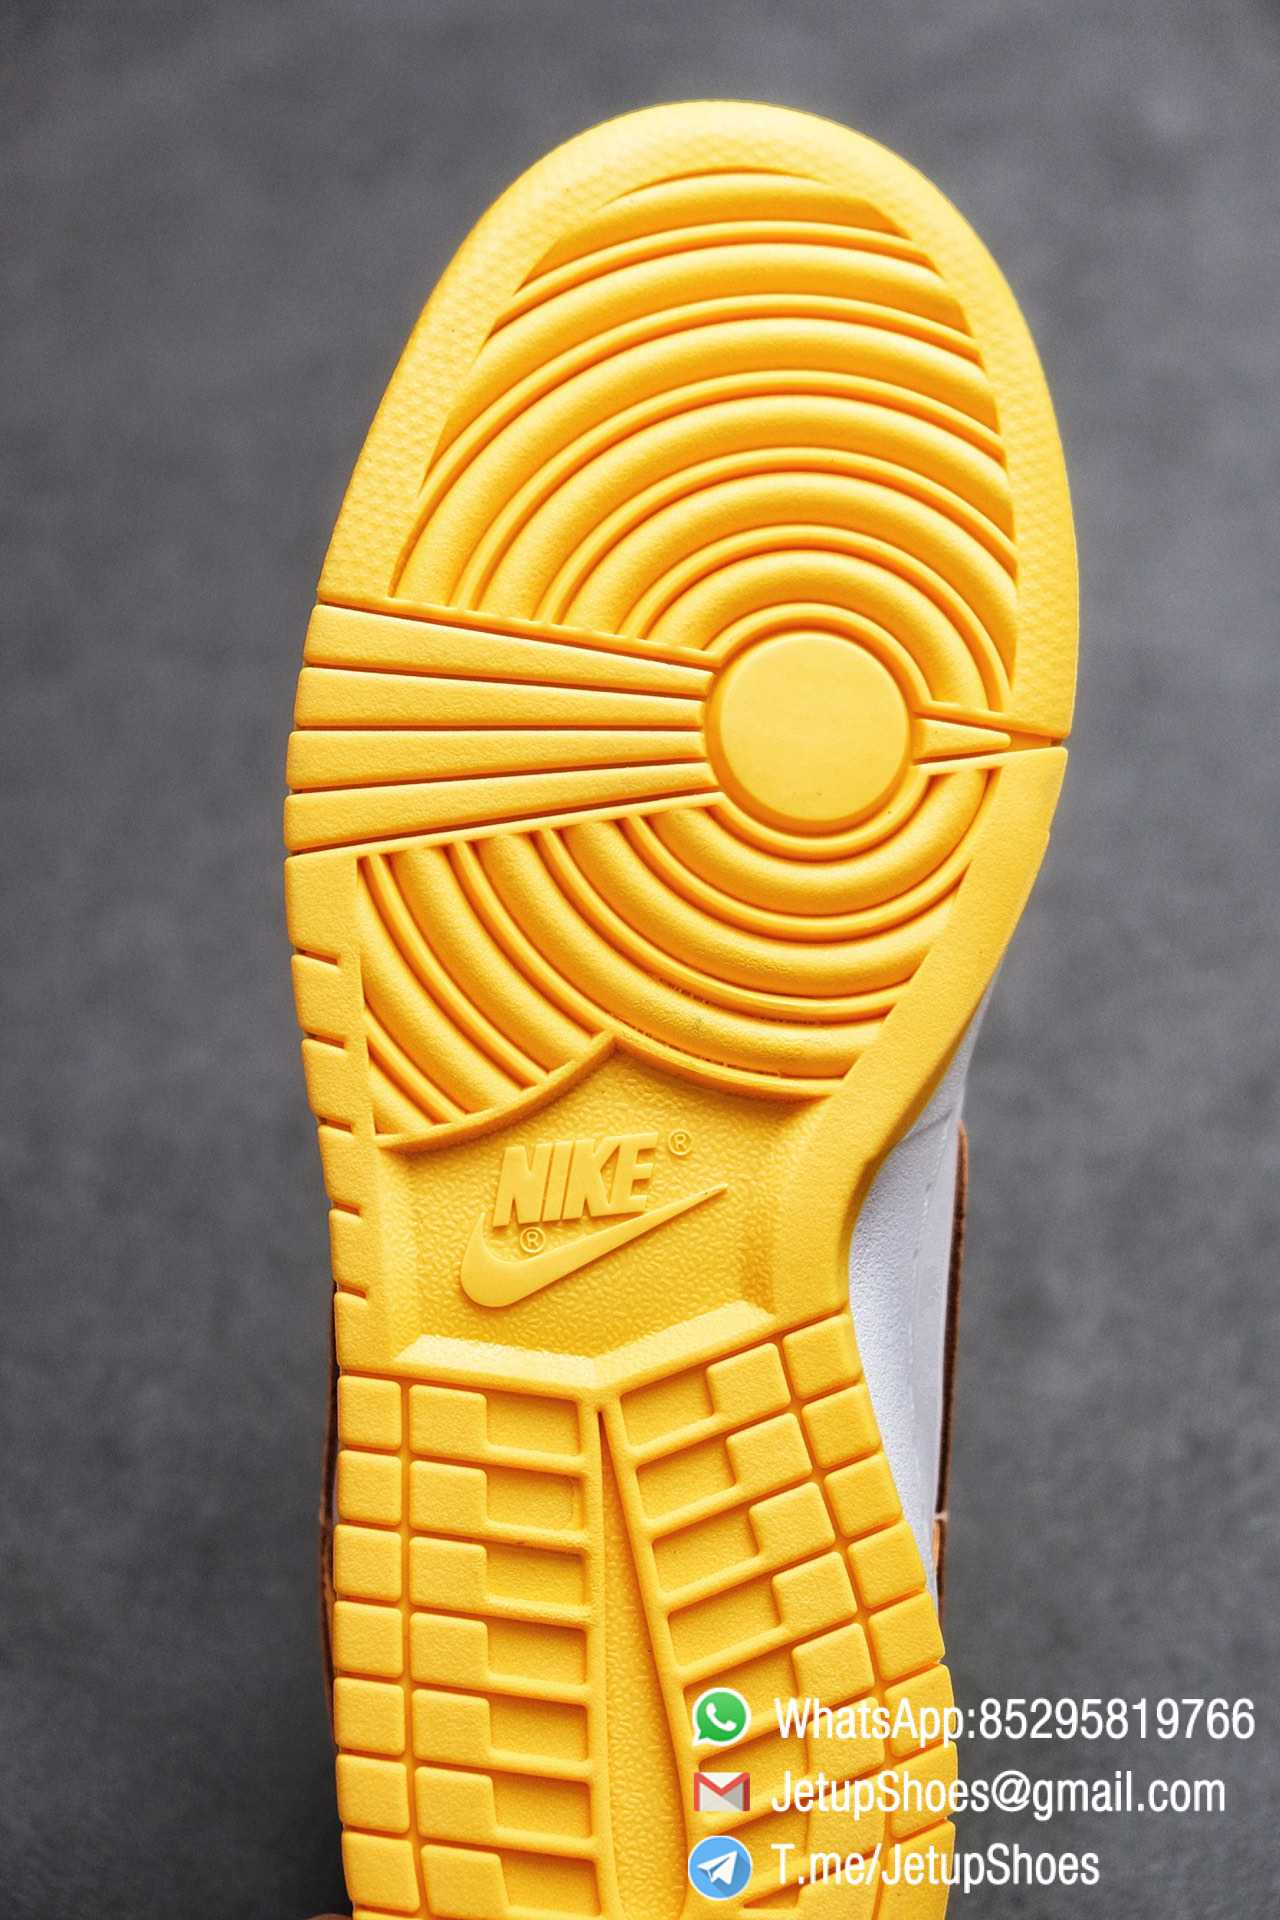 Womens Sneakers Replica Nike SB Dunk Low Laser Orange DD1503 800 Best RepSneakers 09